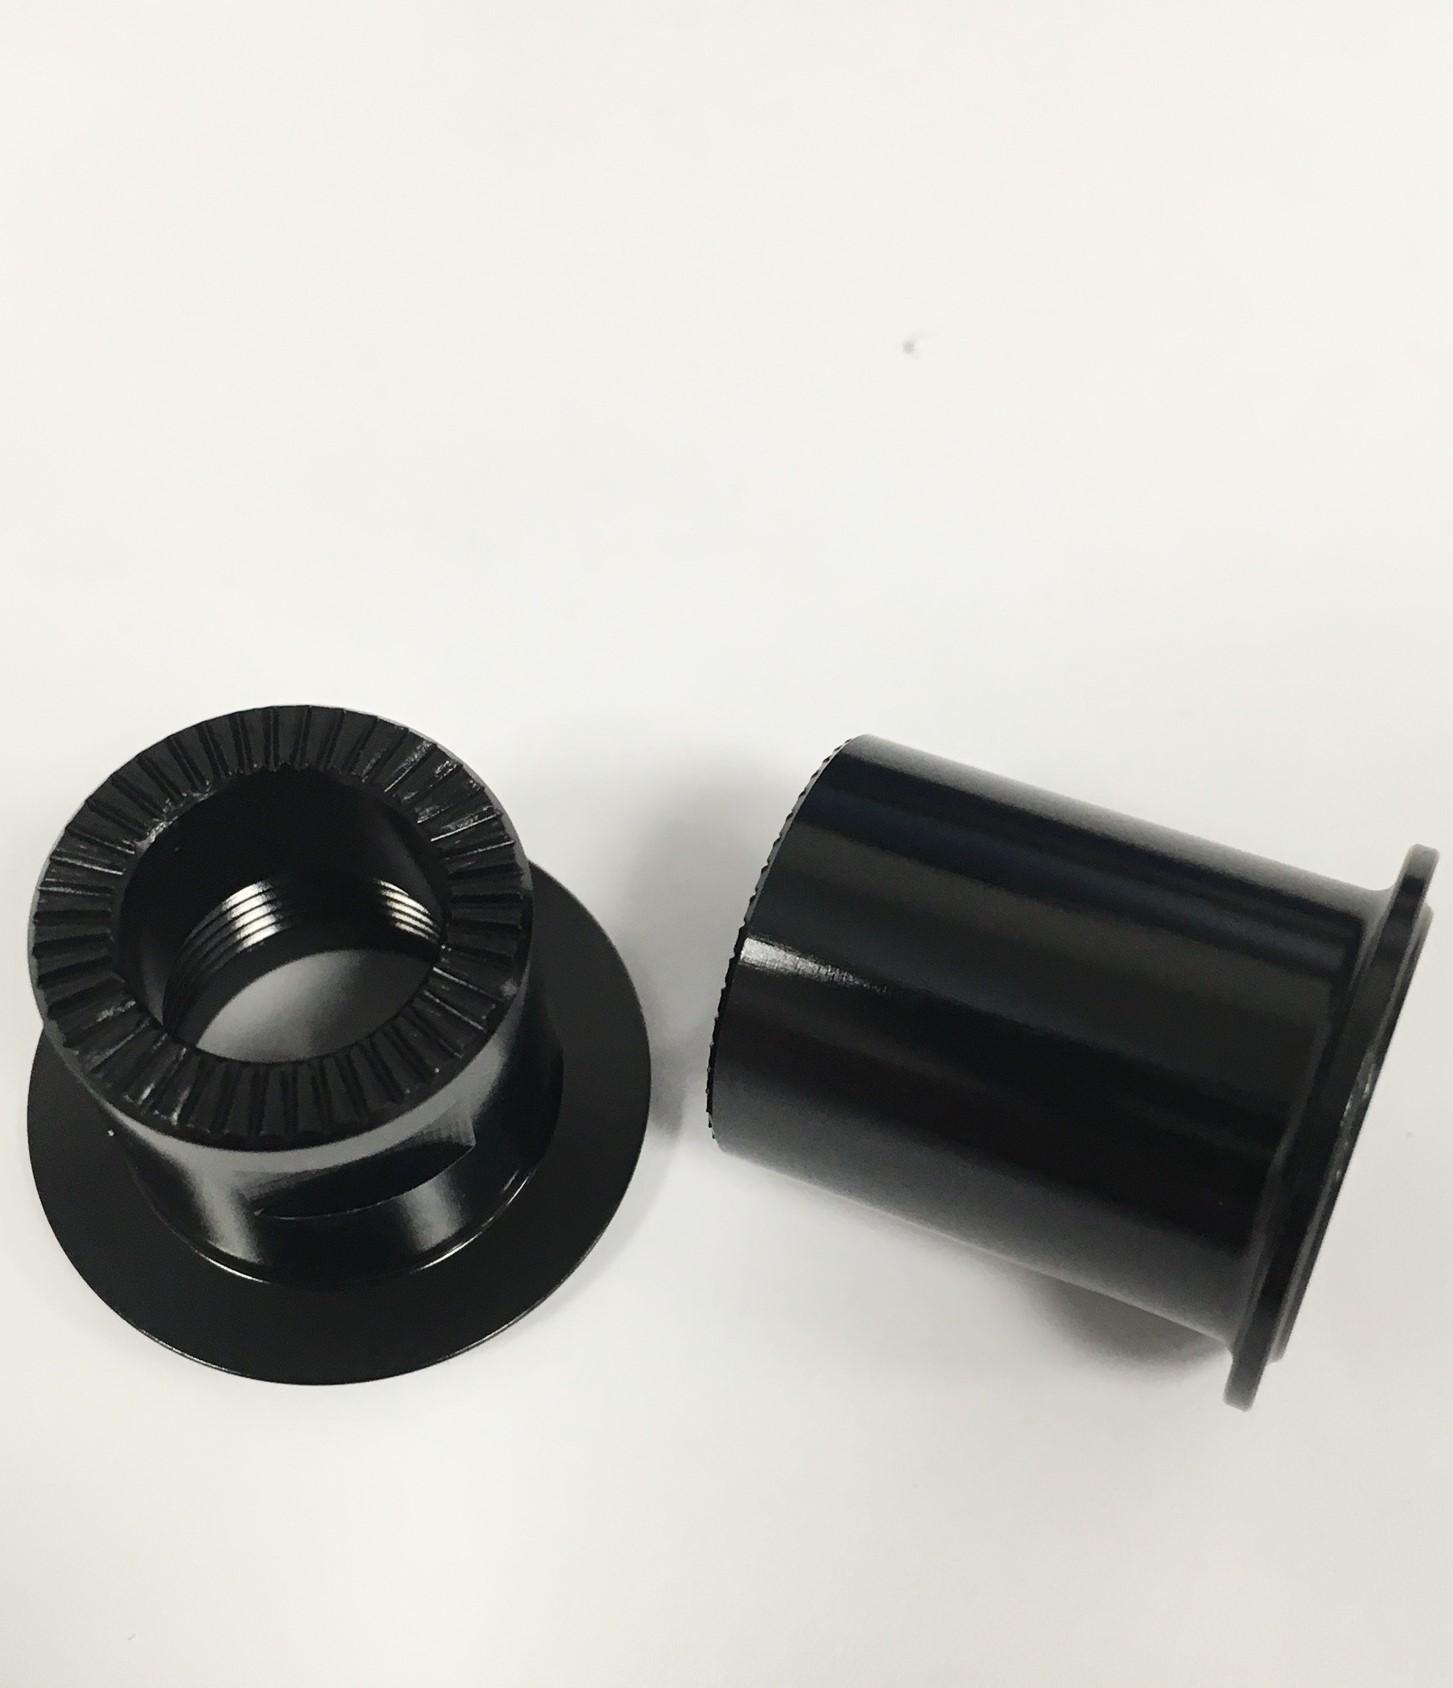 Cero 12x142mm Rear wheel adapter